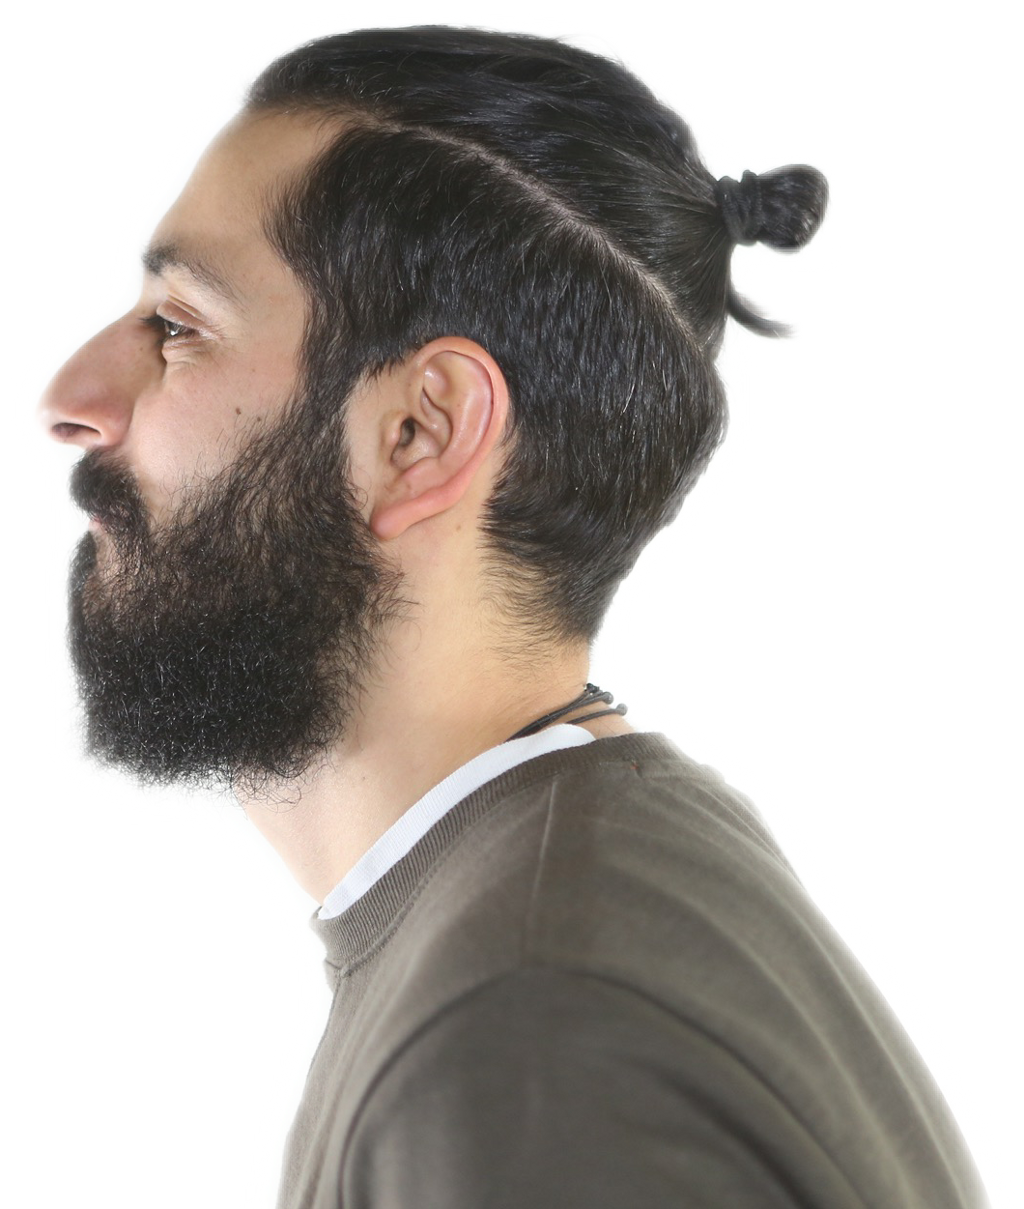 #man #beardprofile